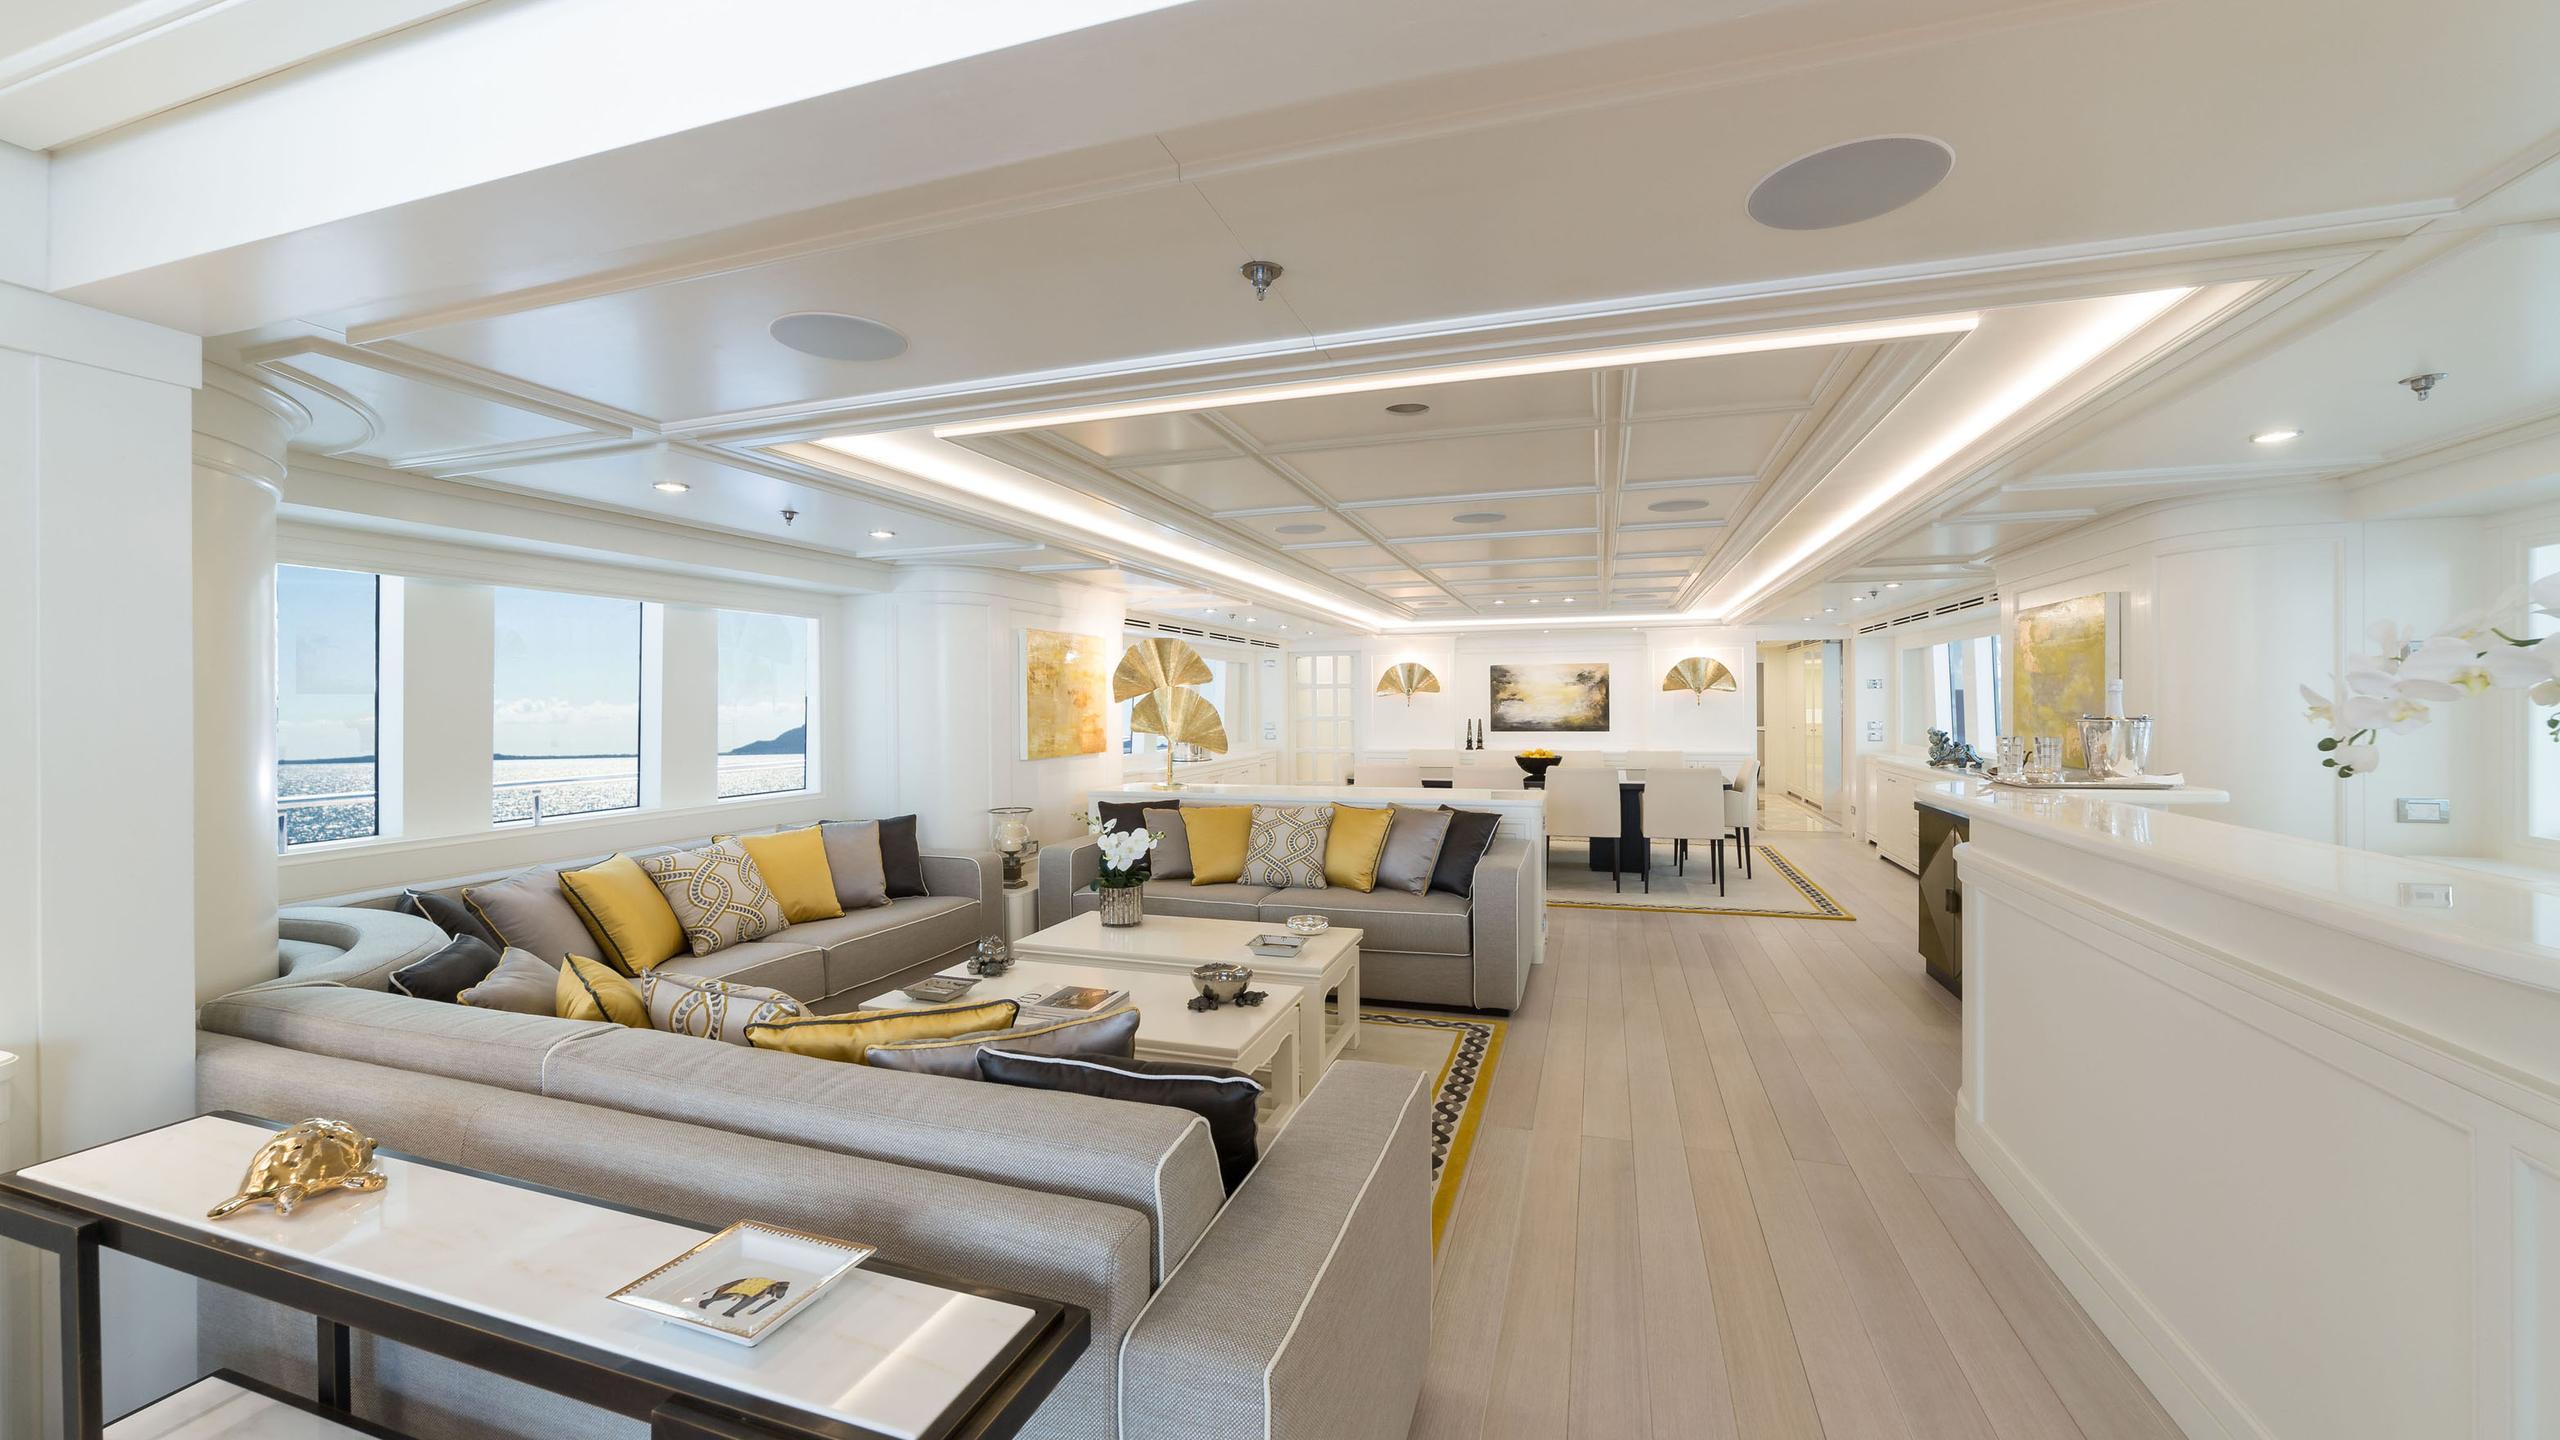 C 122 motoryacht Codecasa 43m 2019 saloon sistership